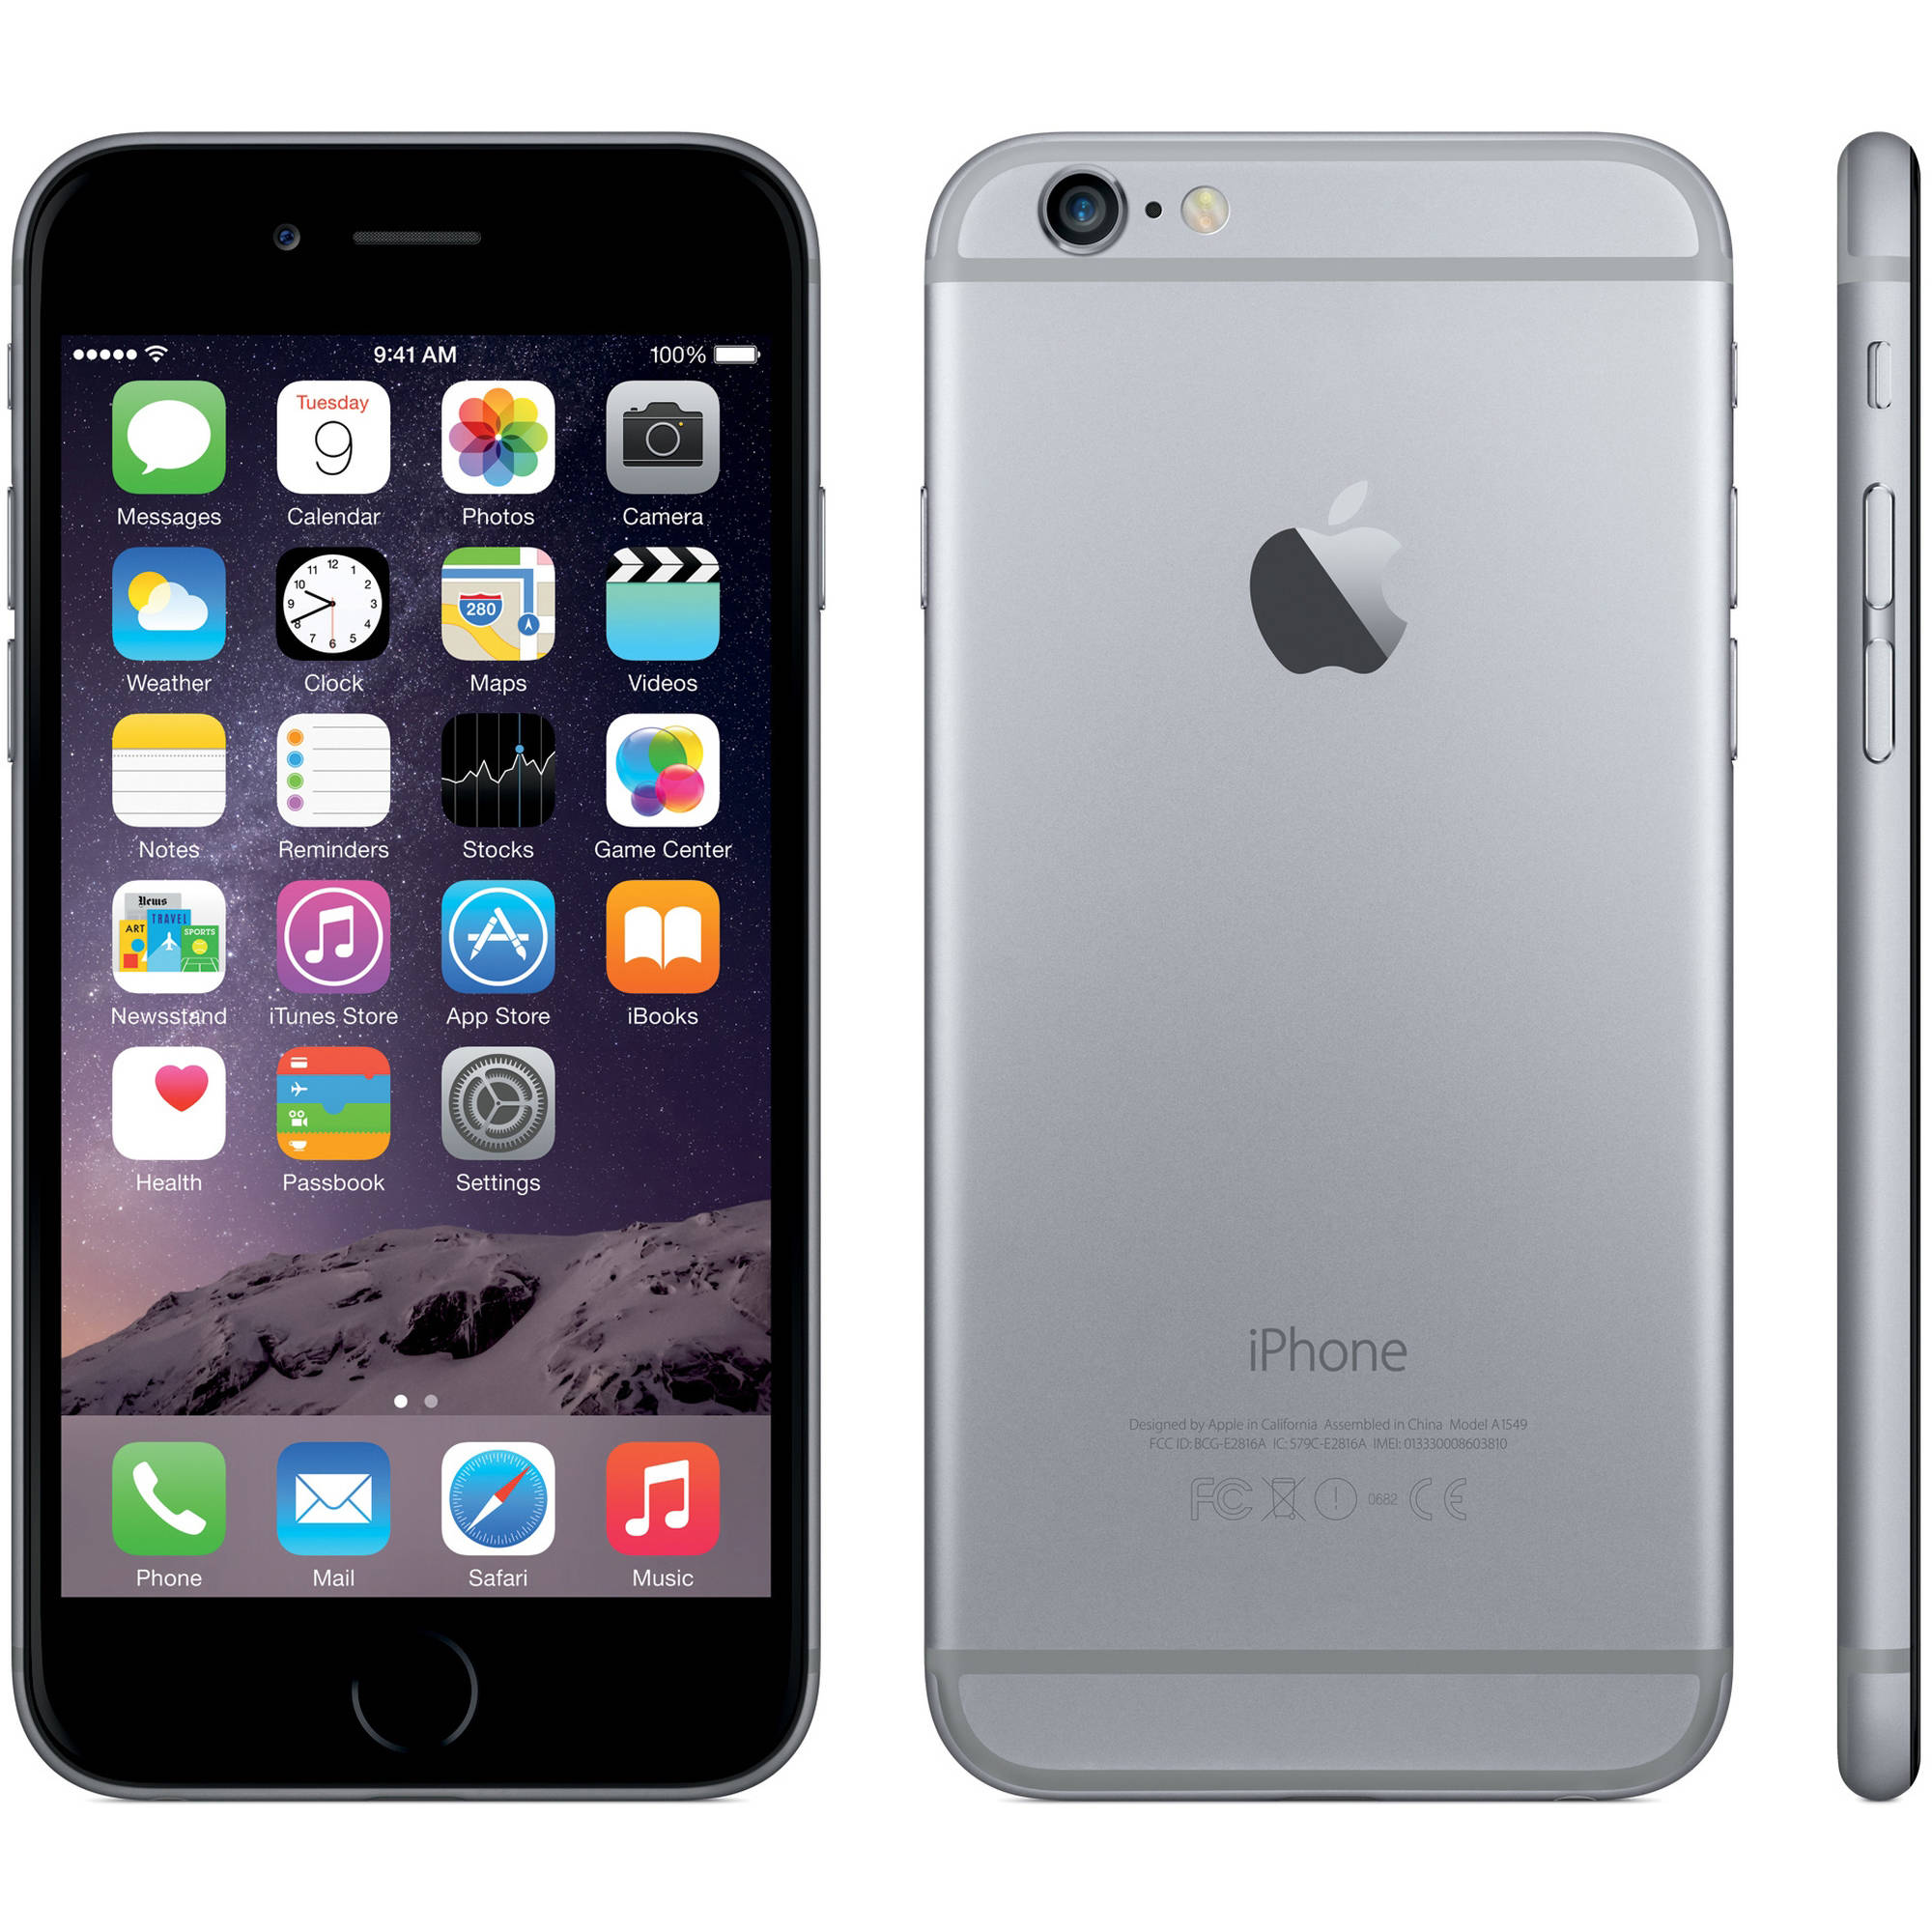 Iphone 5 back png apple iphone 5 16gb - Refurbished Apple Iphone 6 16gb Gsm Smartphone Unlocked